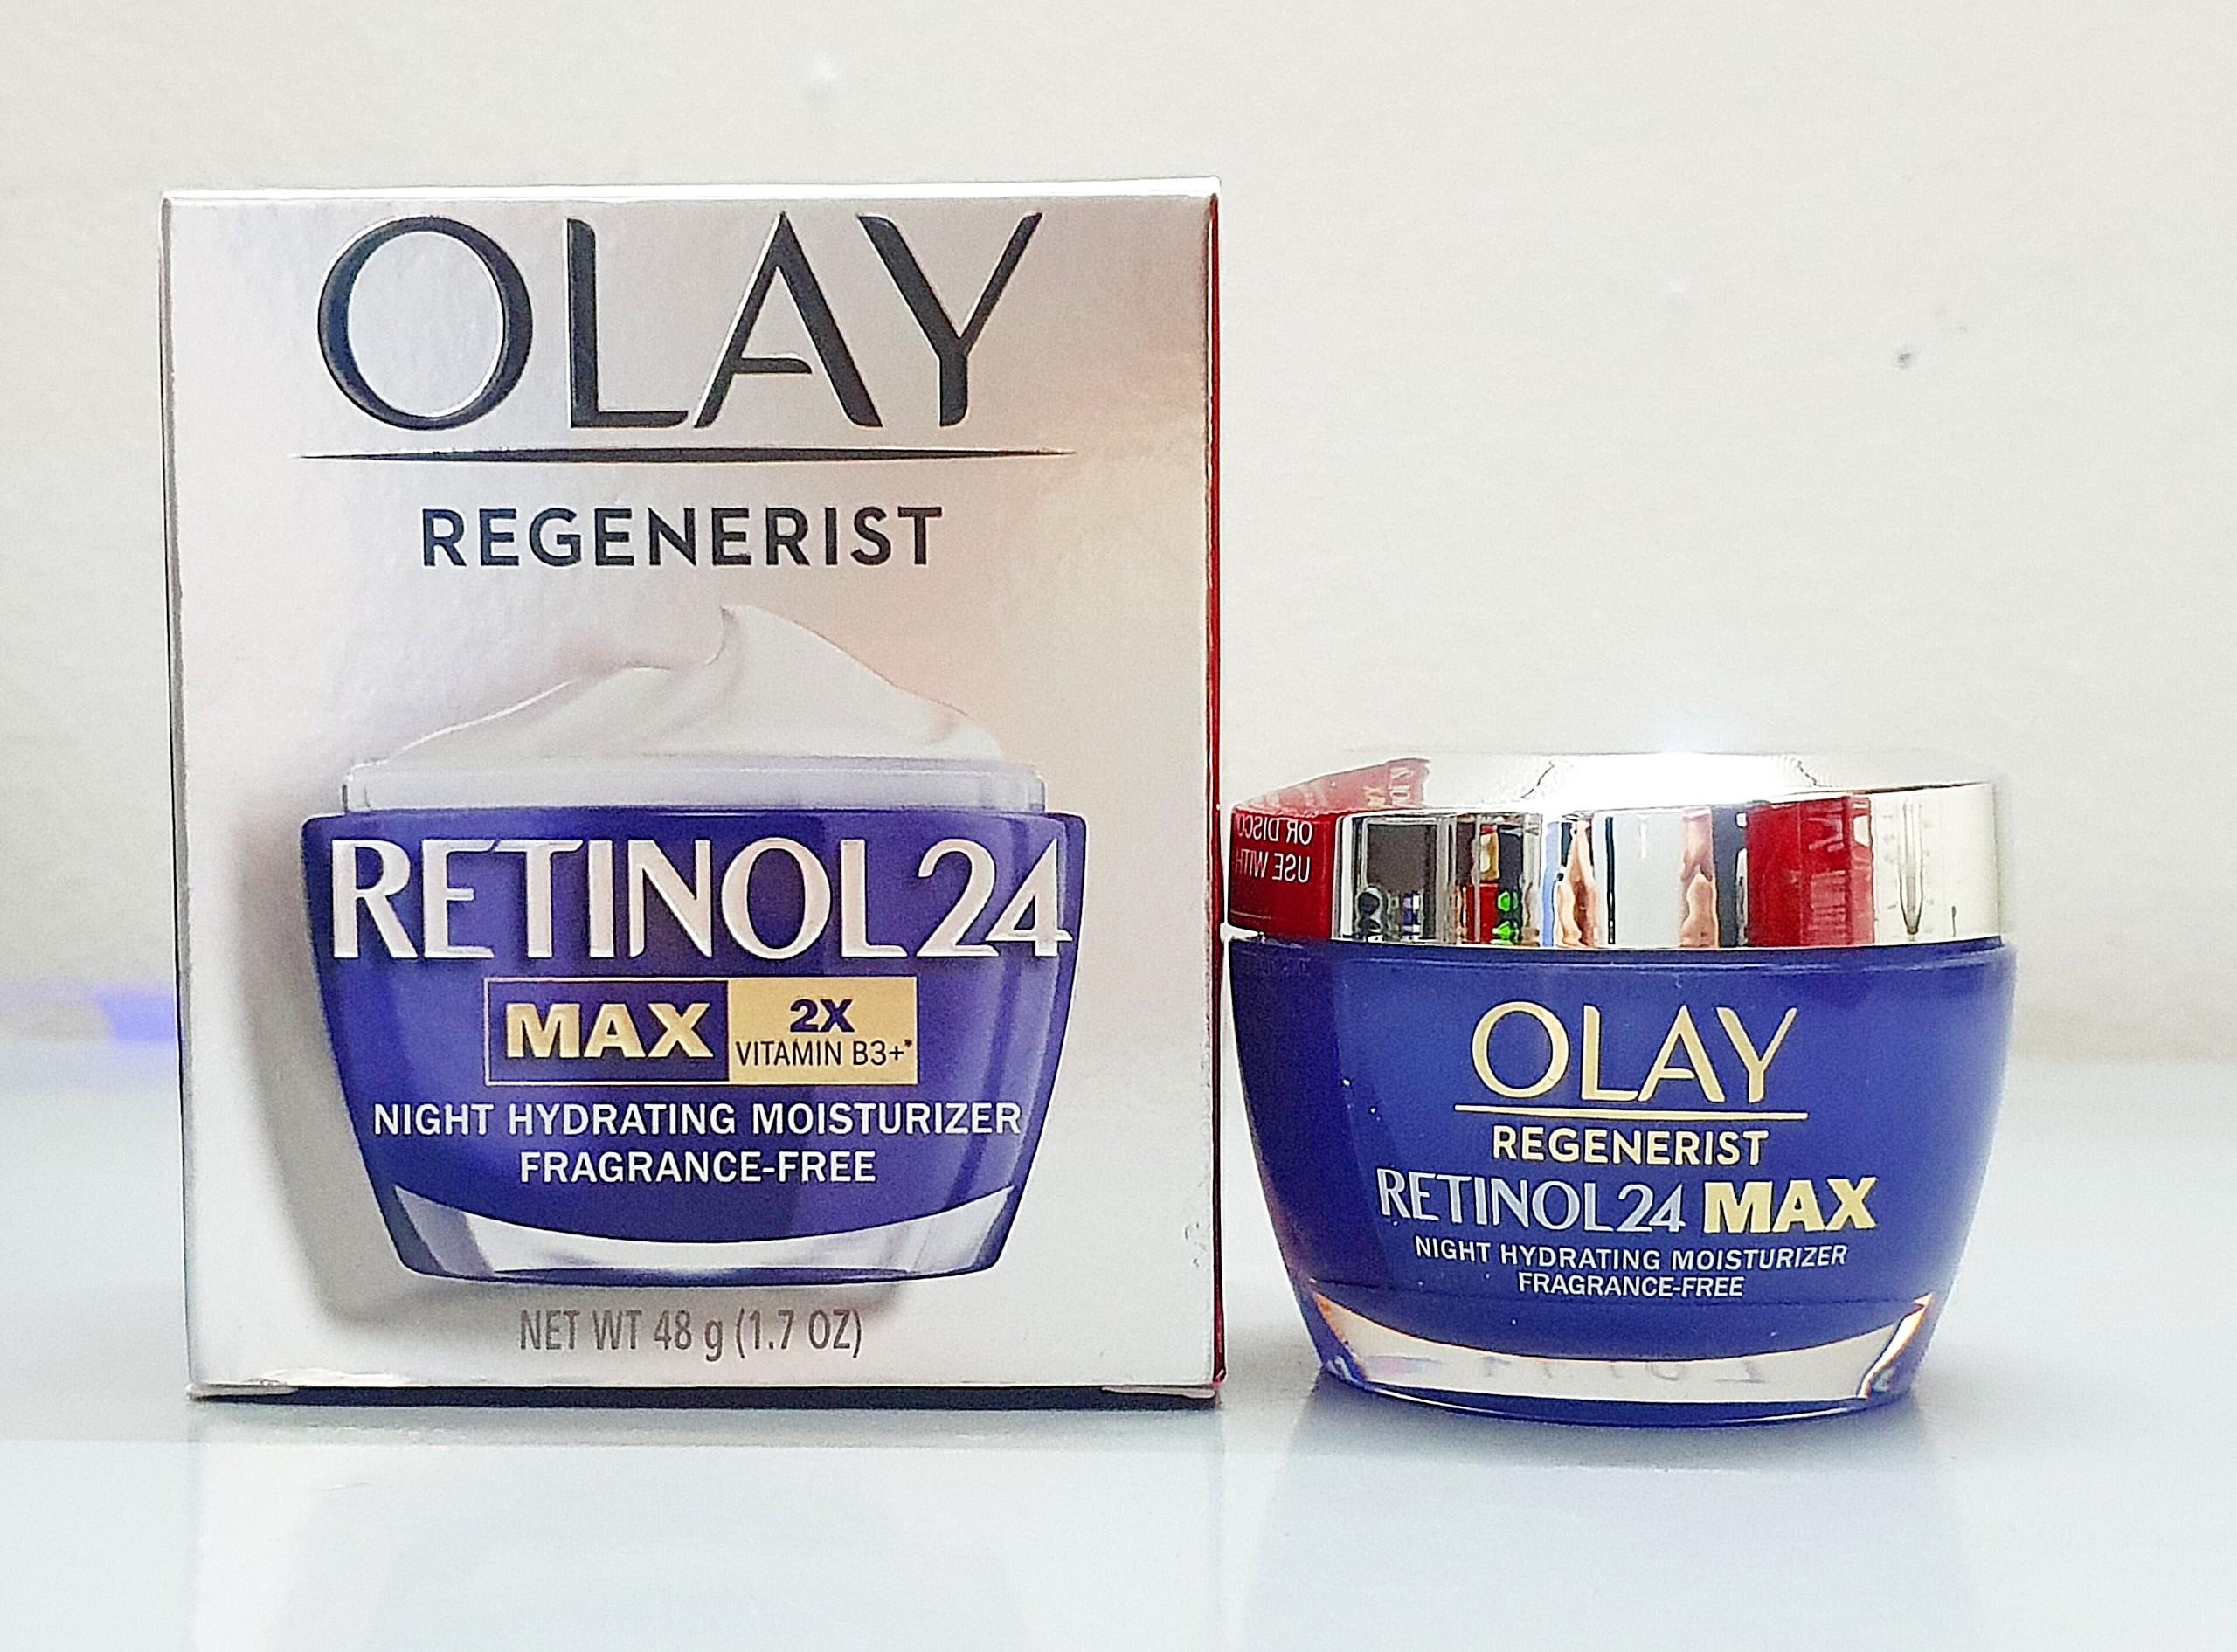 kem duong da ban dem olay retinol 24 max 2x vitamin b3